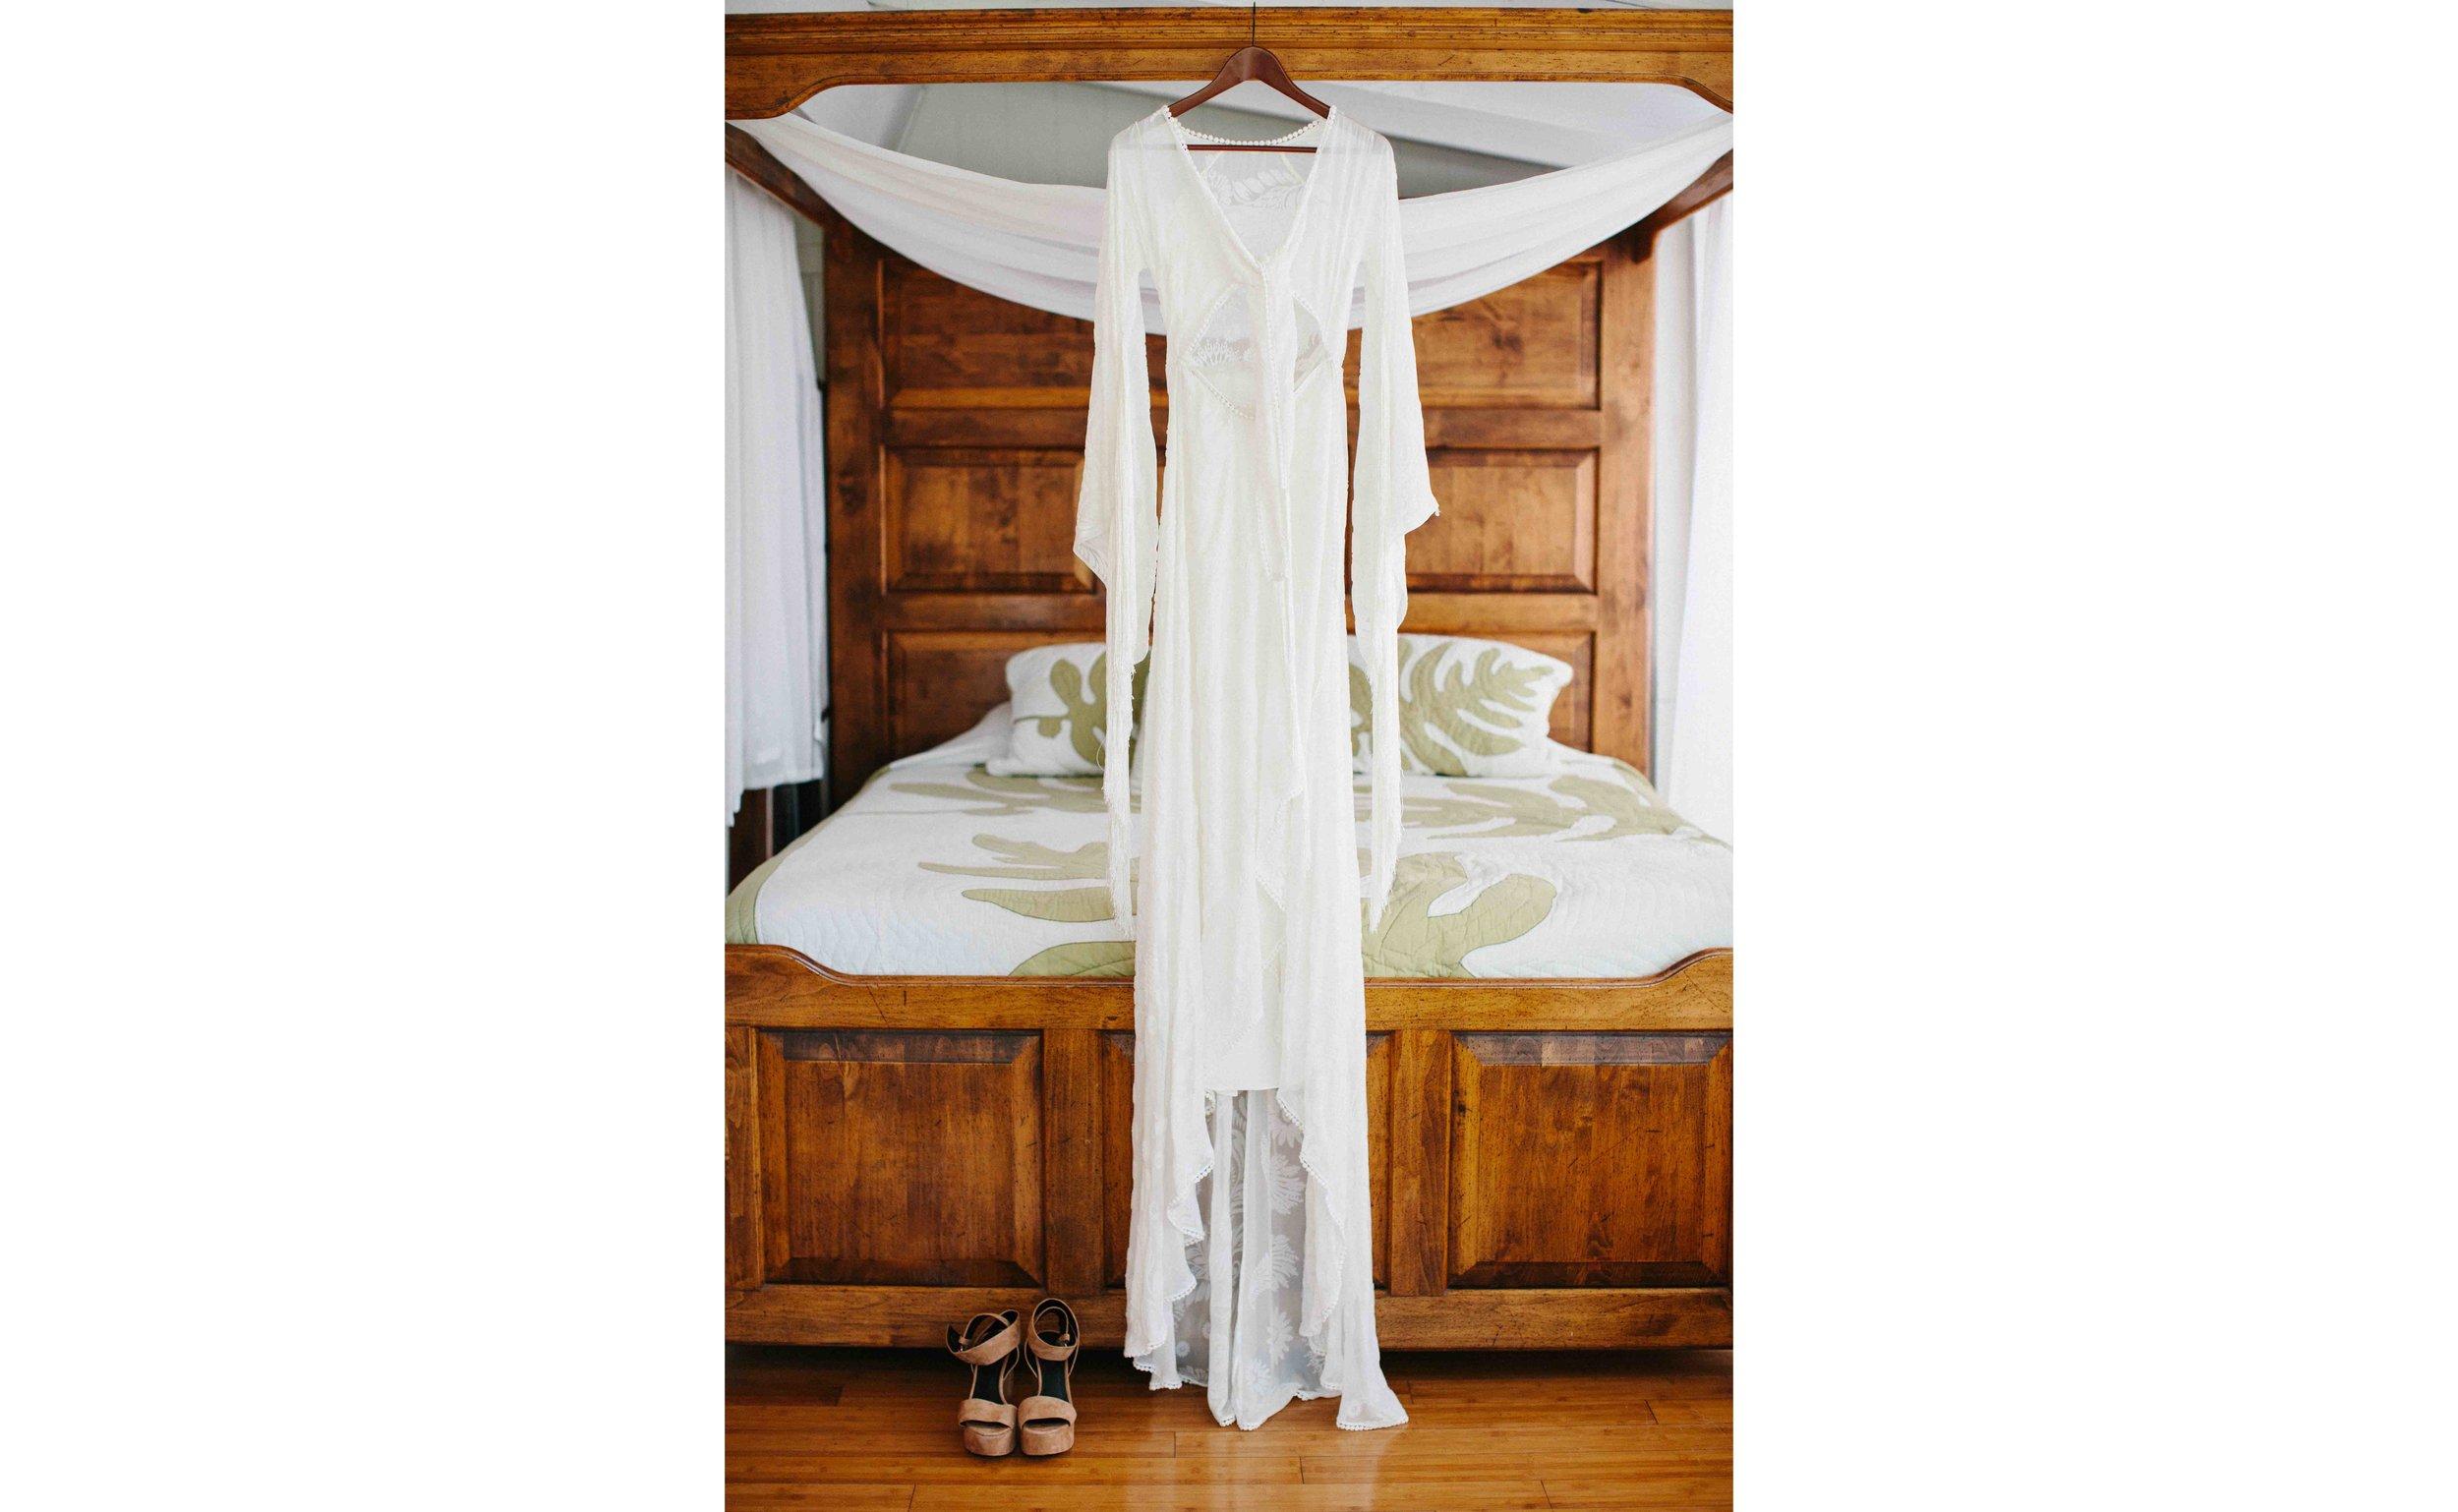 Boho Wedding Dress Hanging in Bridal Suite